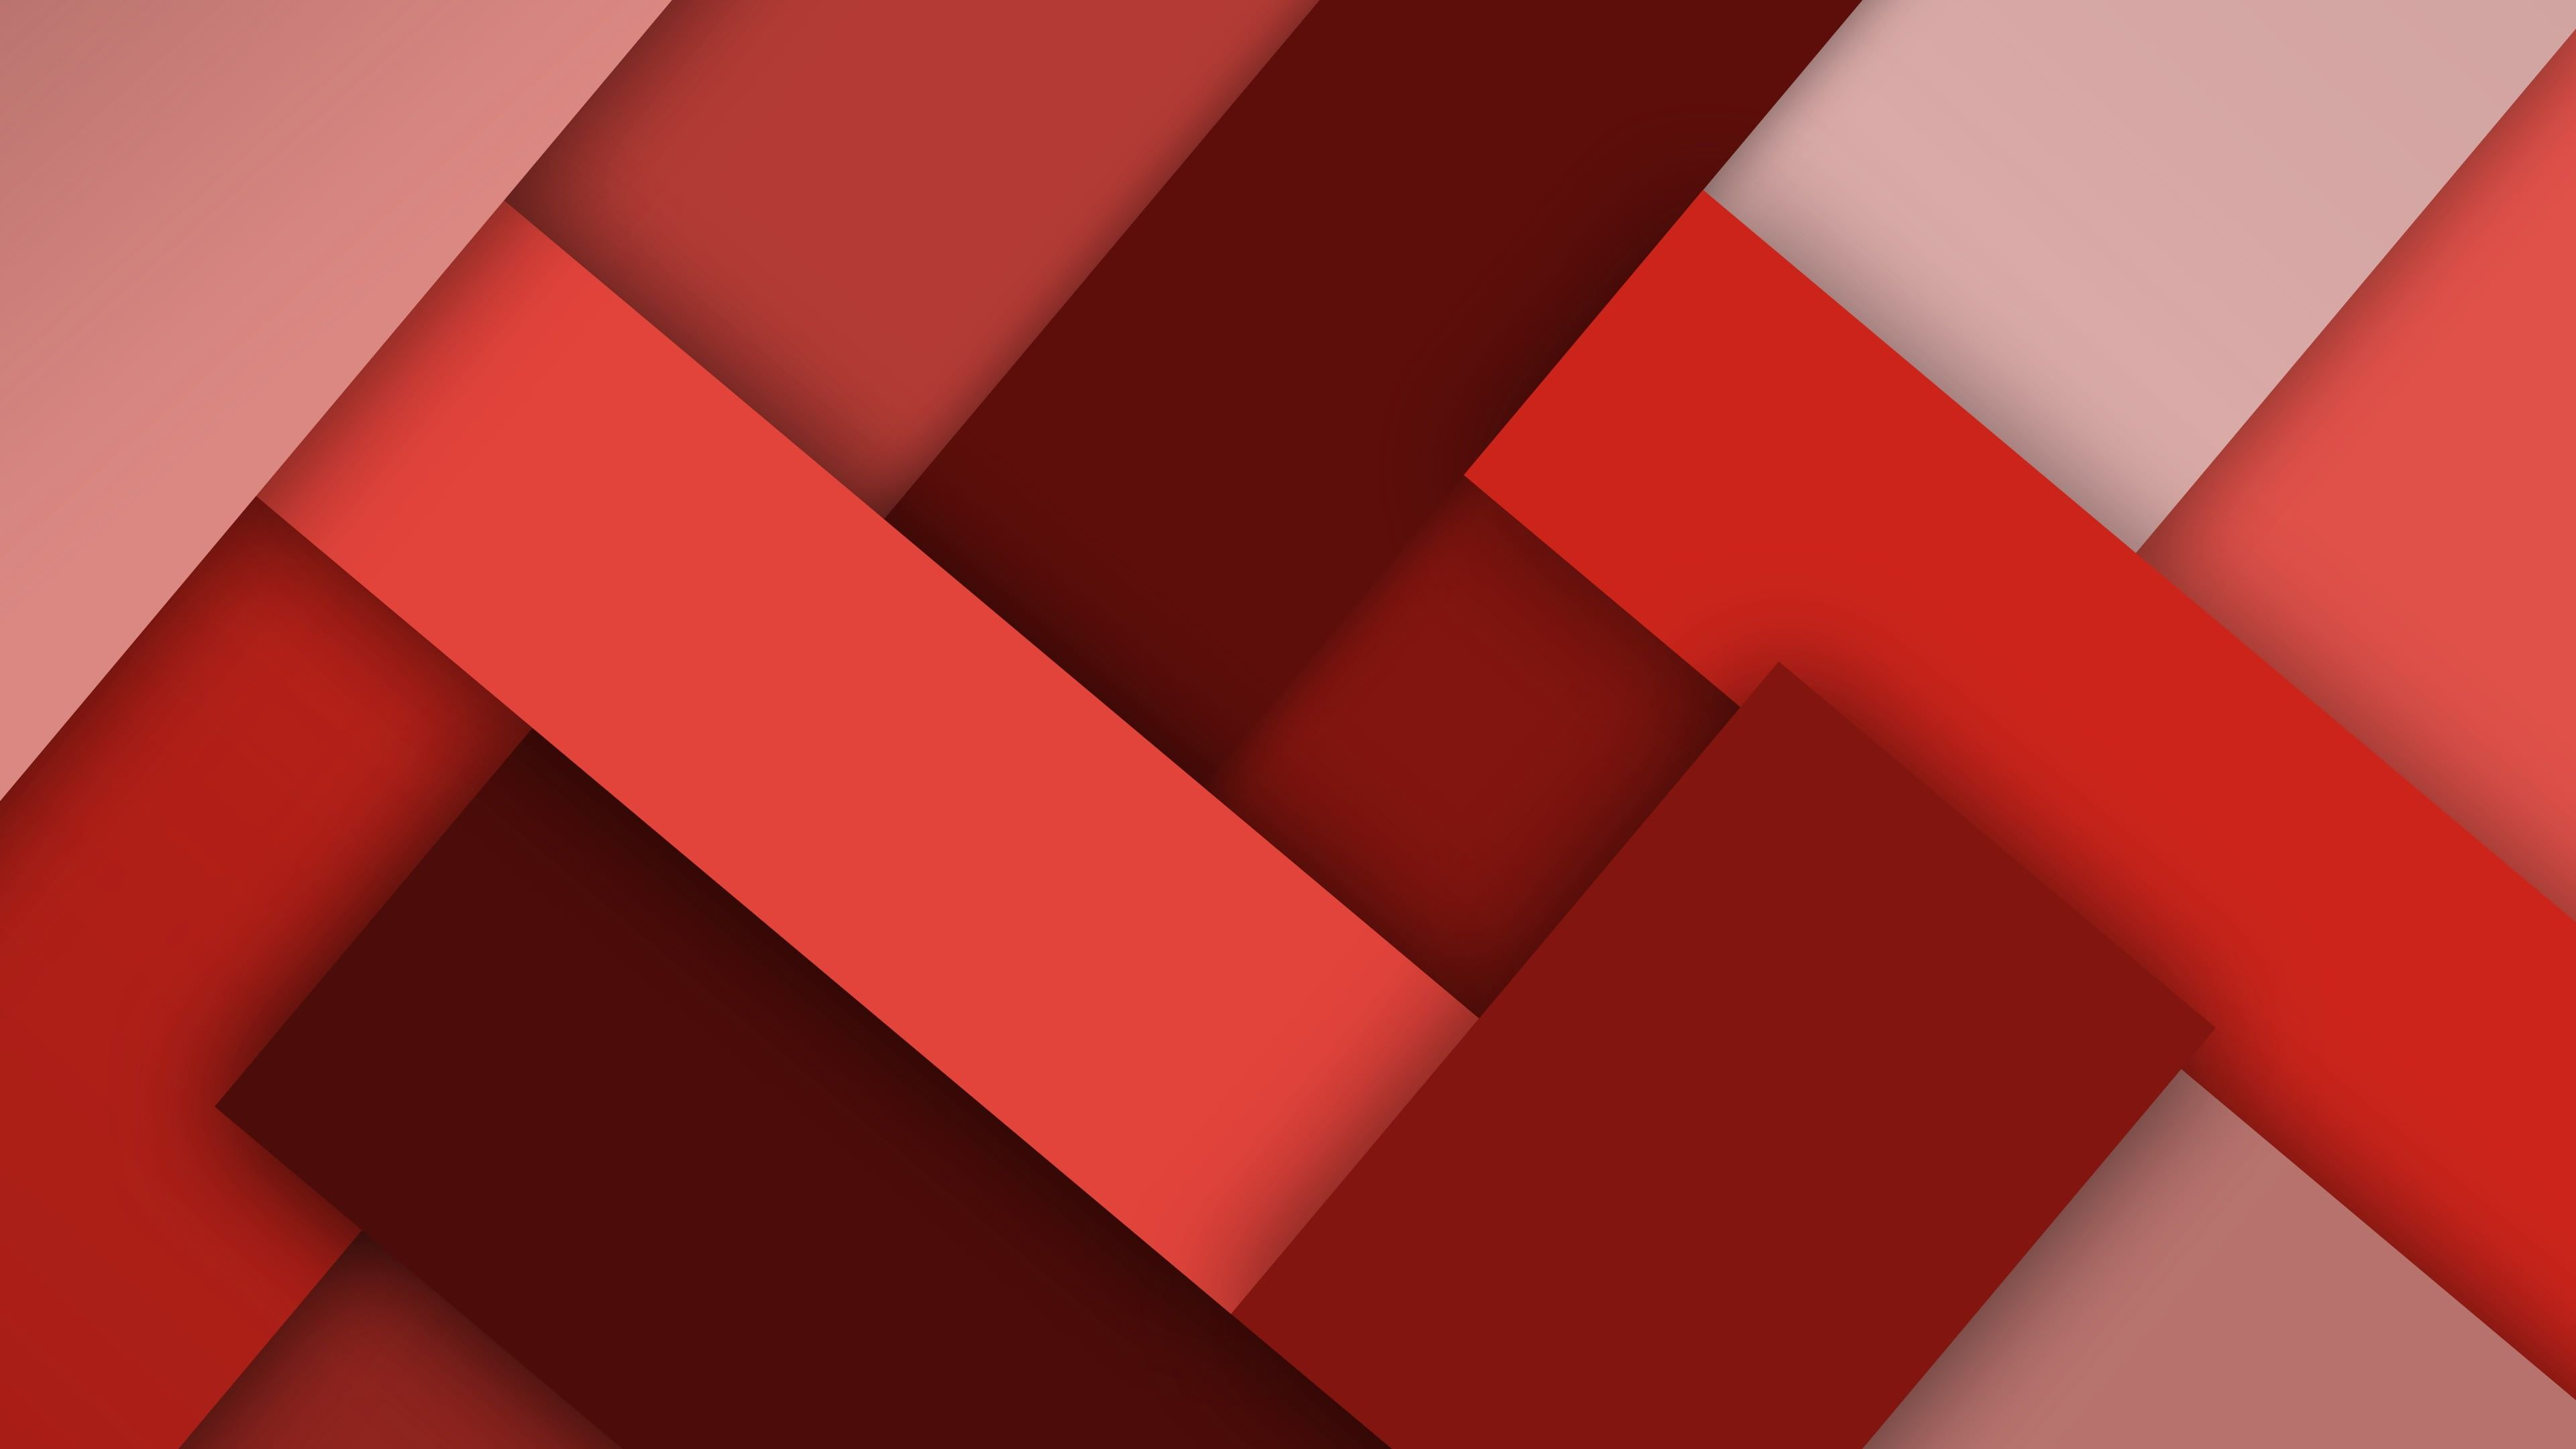 Red And White Wallpaper Minimalism Digital Art Simple 4k Wallpaper Hdwallpaper Desktop In 2020 Abstract Computer Wallpaper Desktop Wallpapers Wallpaper